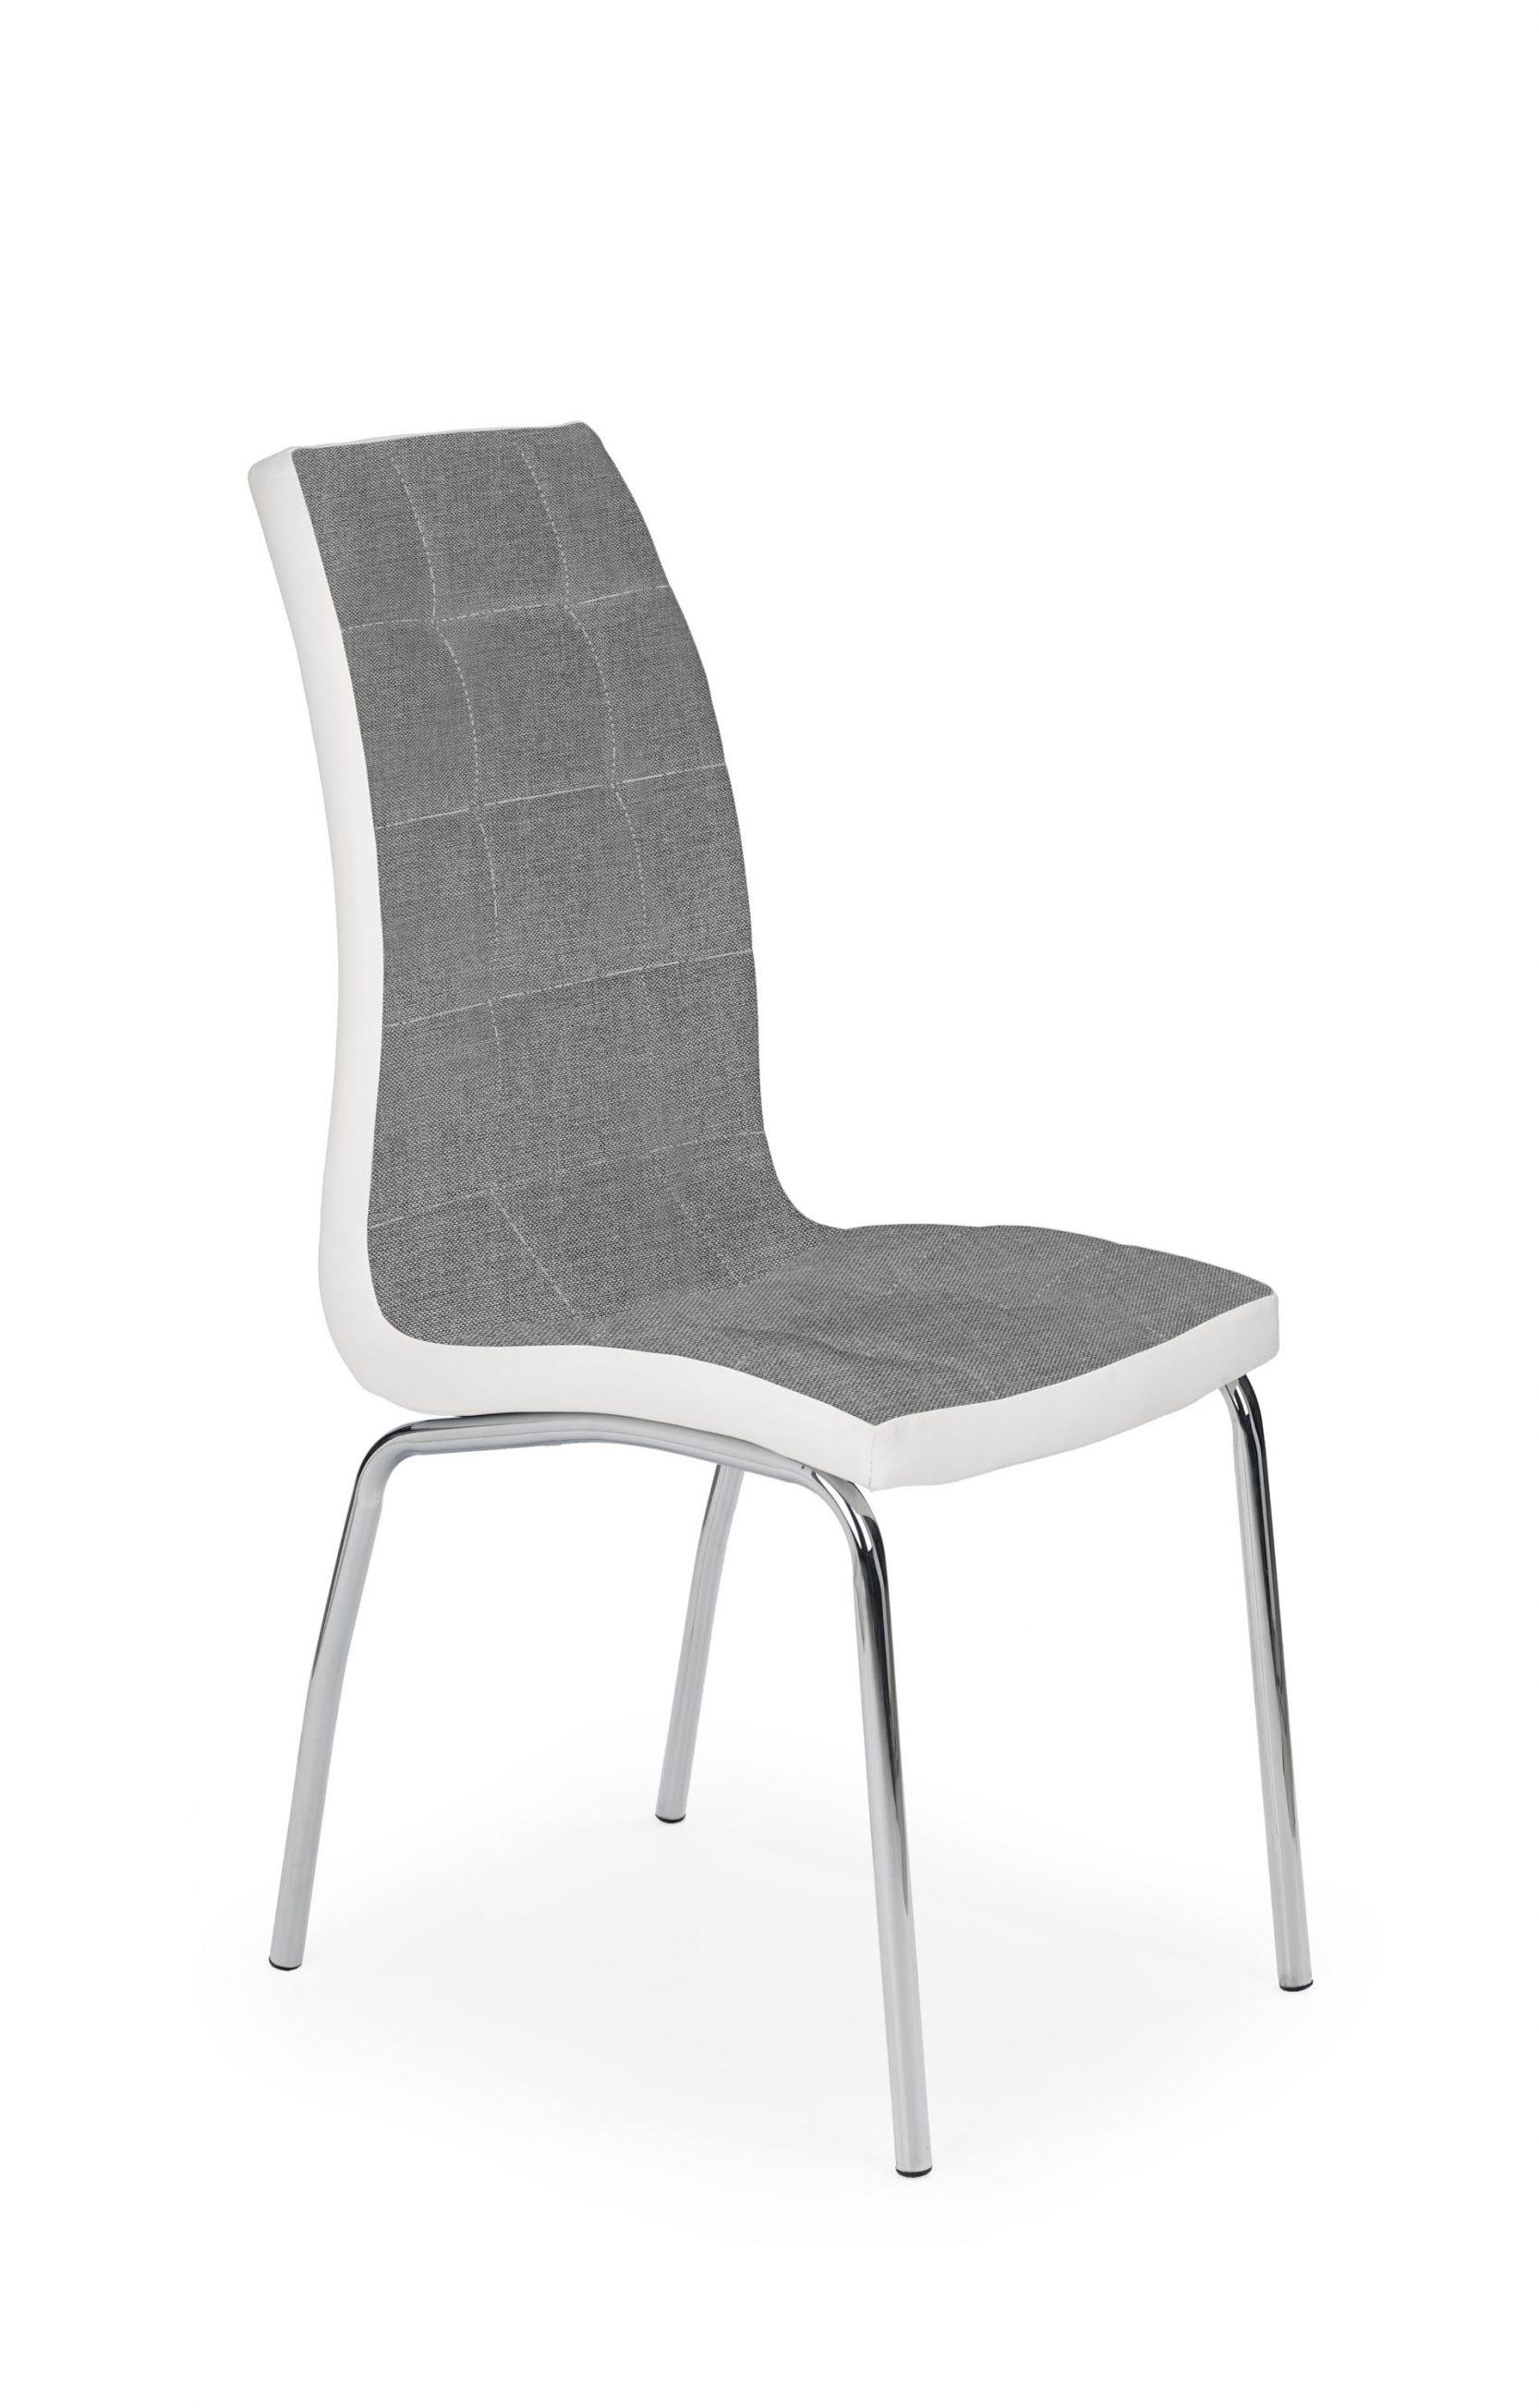 Scaun tapitat cu stofa si piele ecologica, cu picioare metalice K347 Gri / Alb, l42xA63xH96 cm somproduct.ro